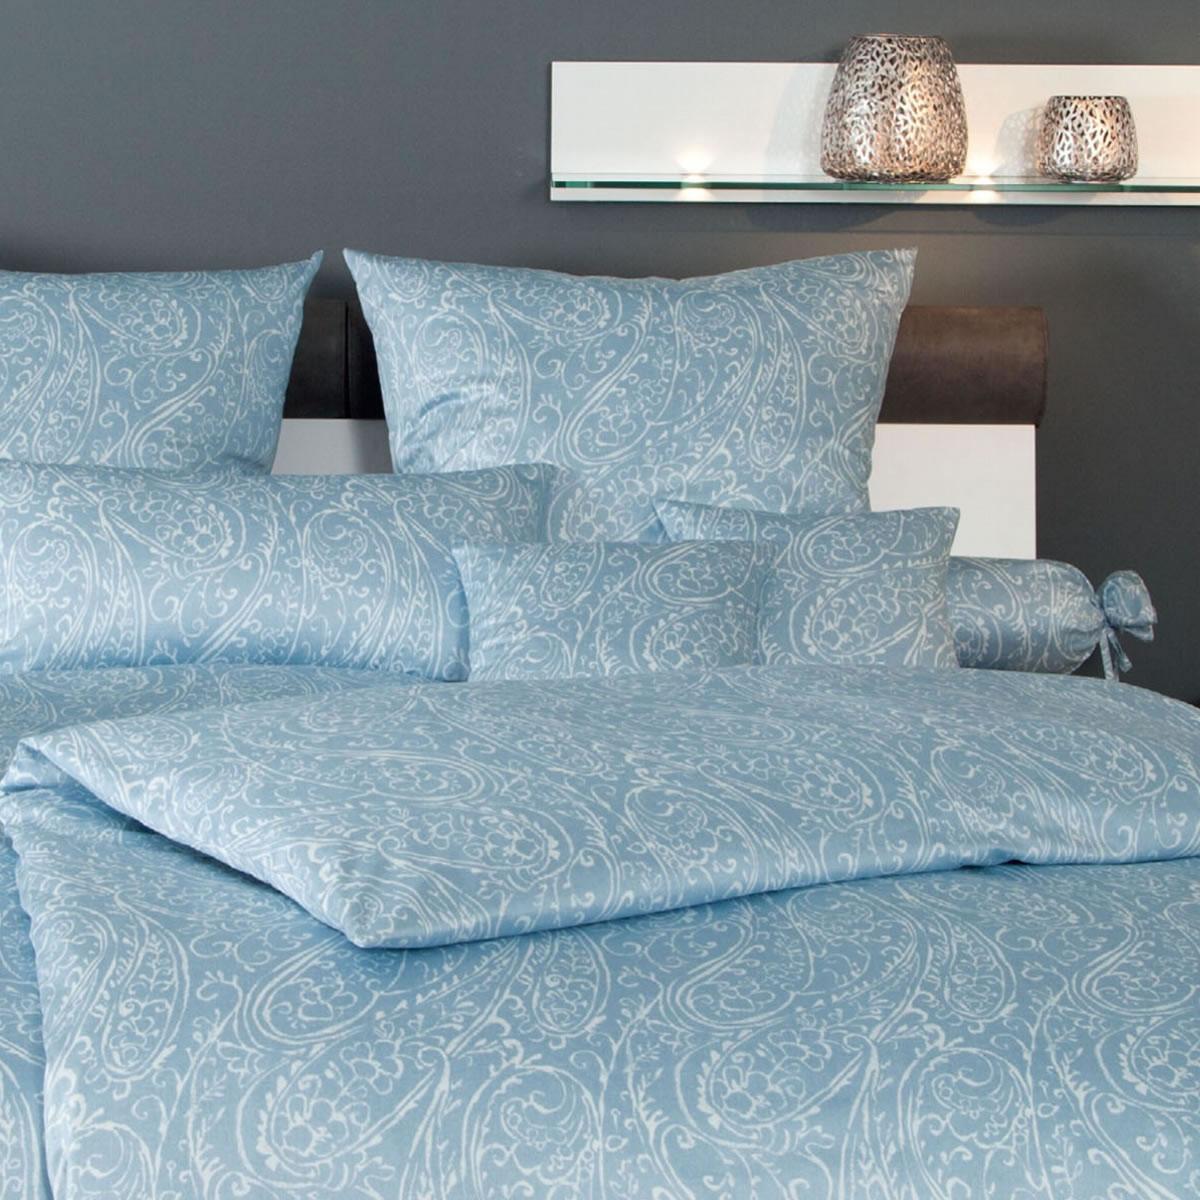 janine mako interlock jersey bettw sche carmen design 5507 02 paisley blau wei ebay. Black Bedroom Furniture Sets. Home Design Ideas